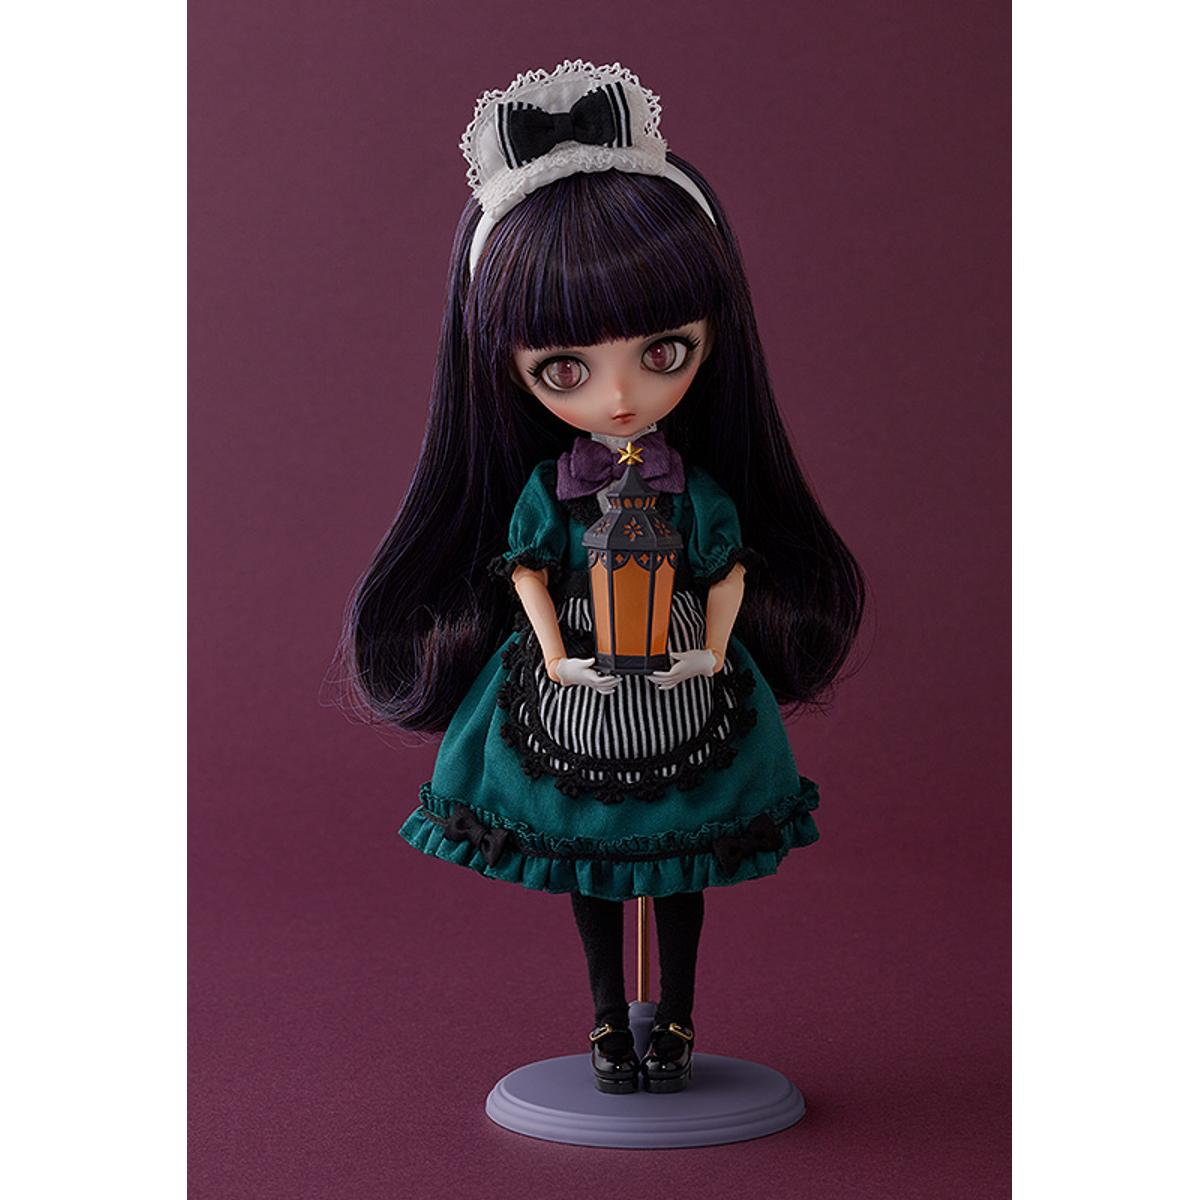 Harmonia bloom Seasonal Doll Outfit Set Dorothy